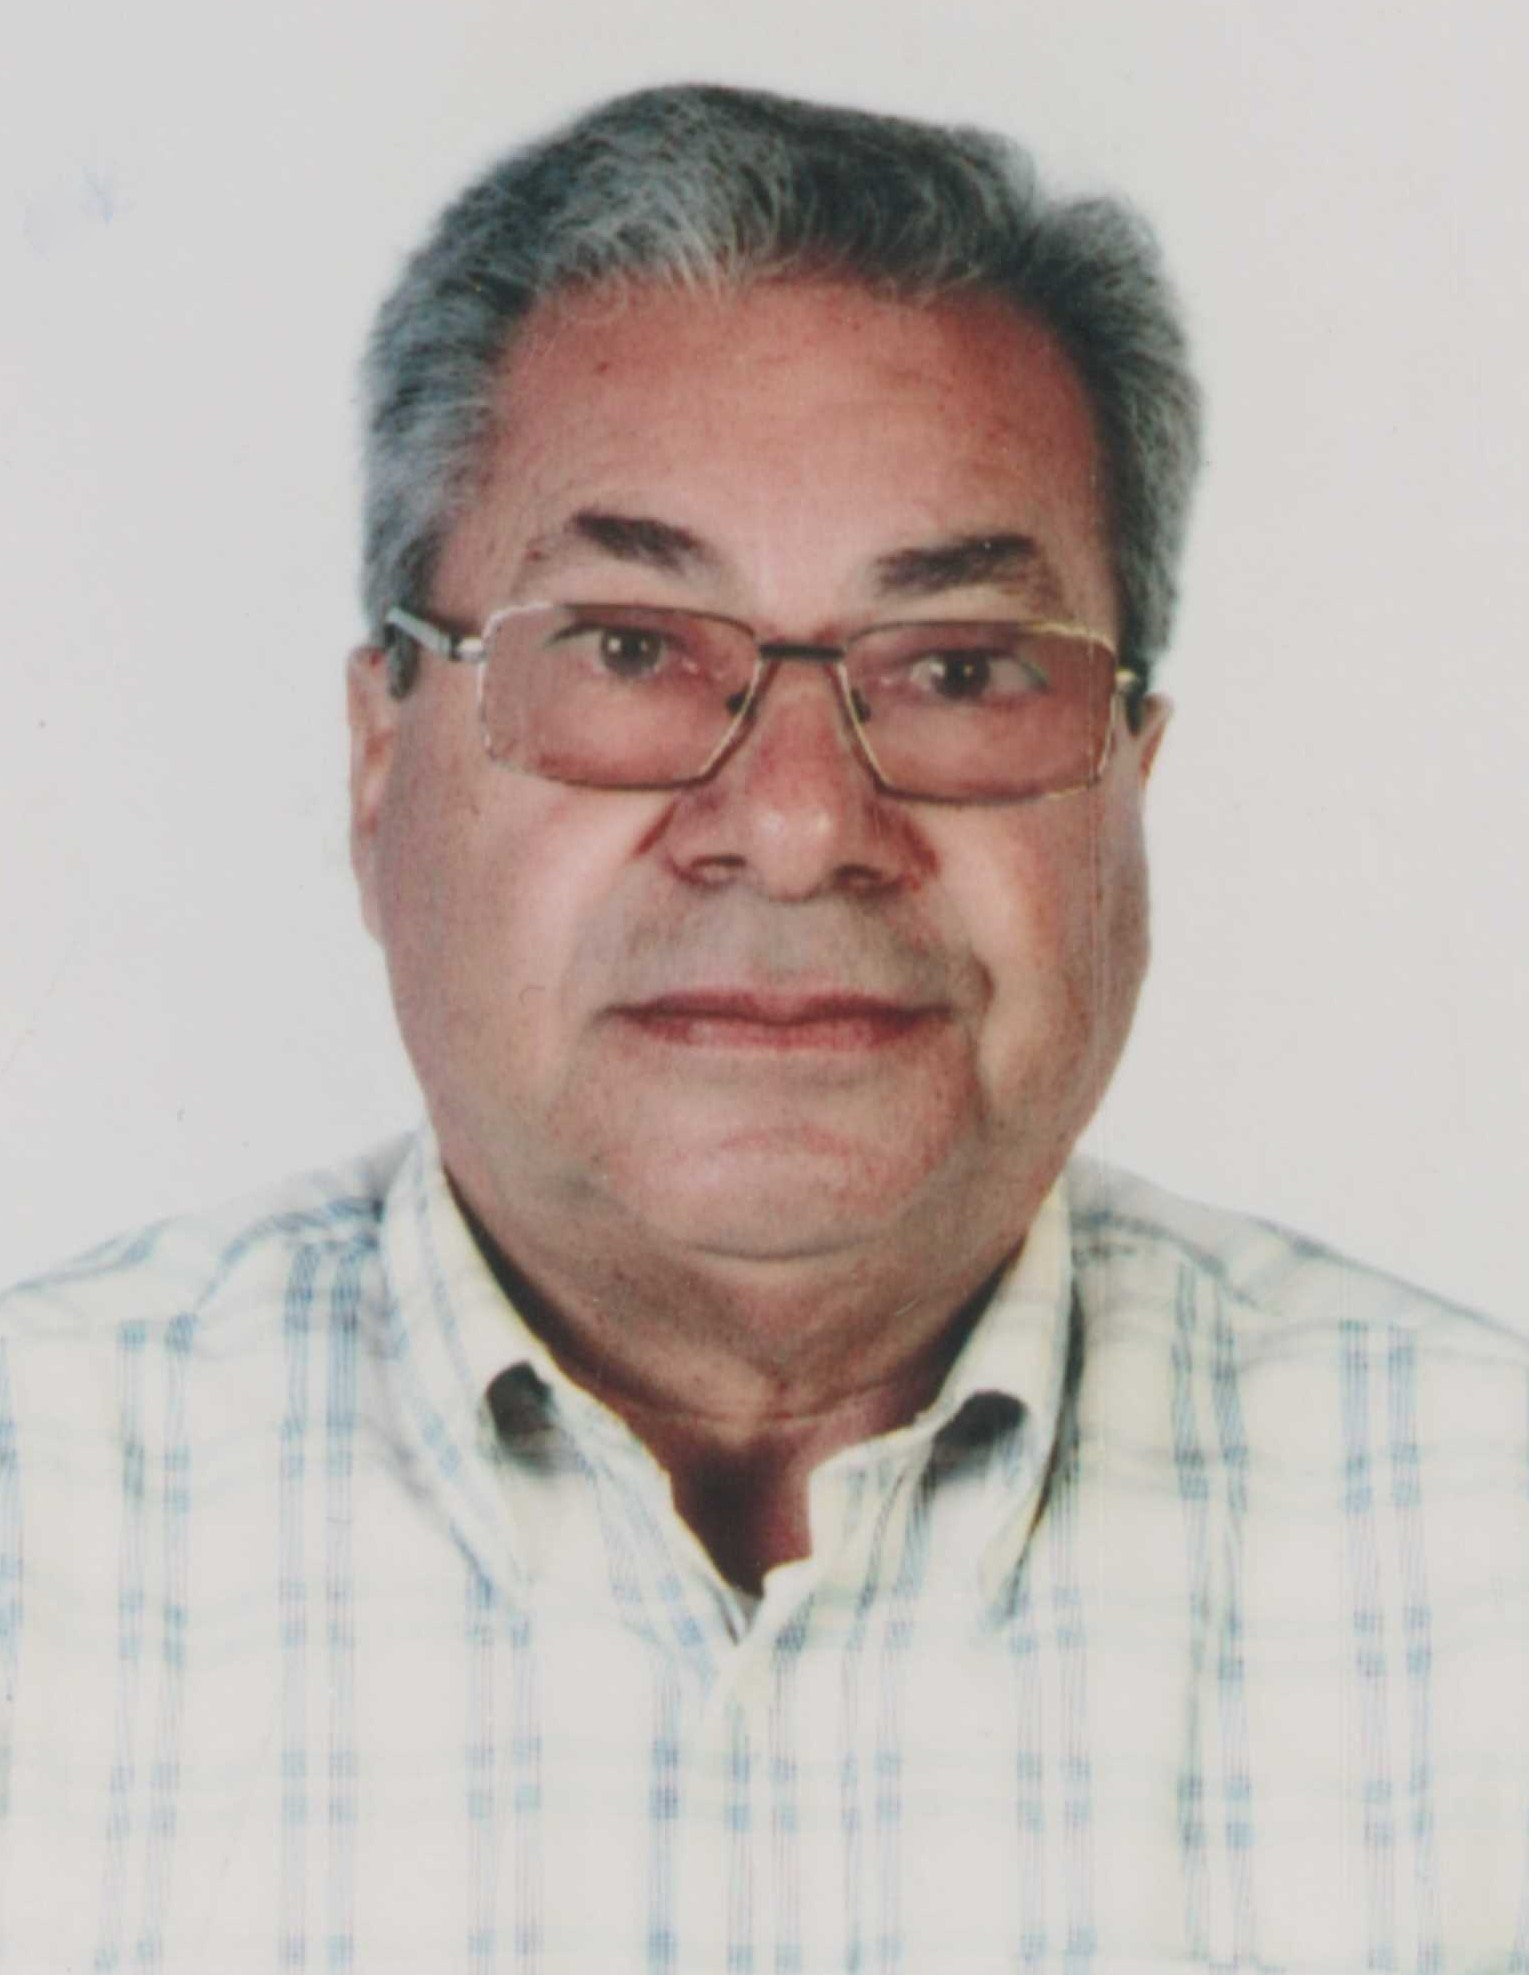 José António Viegas Gago